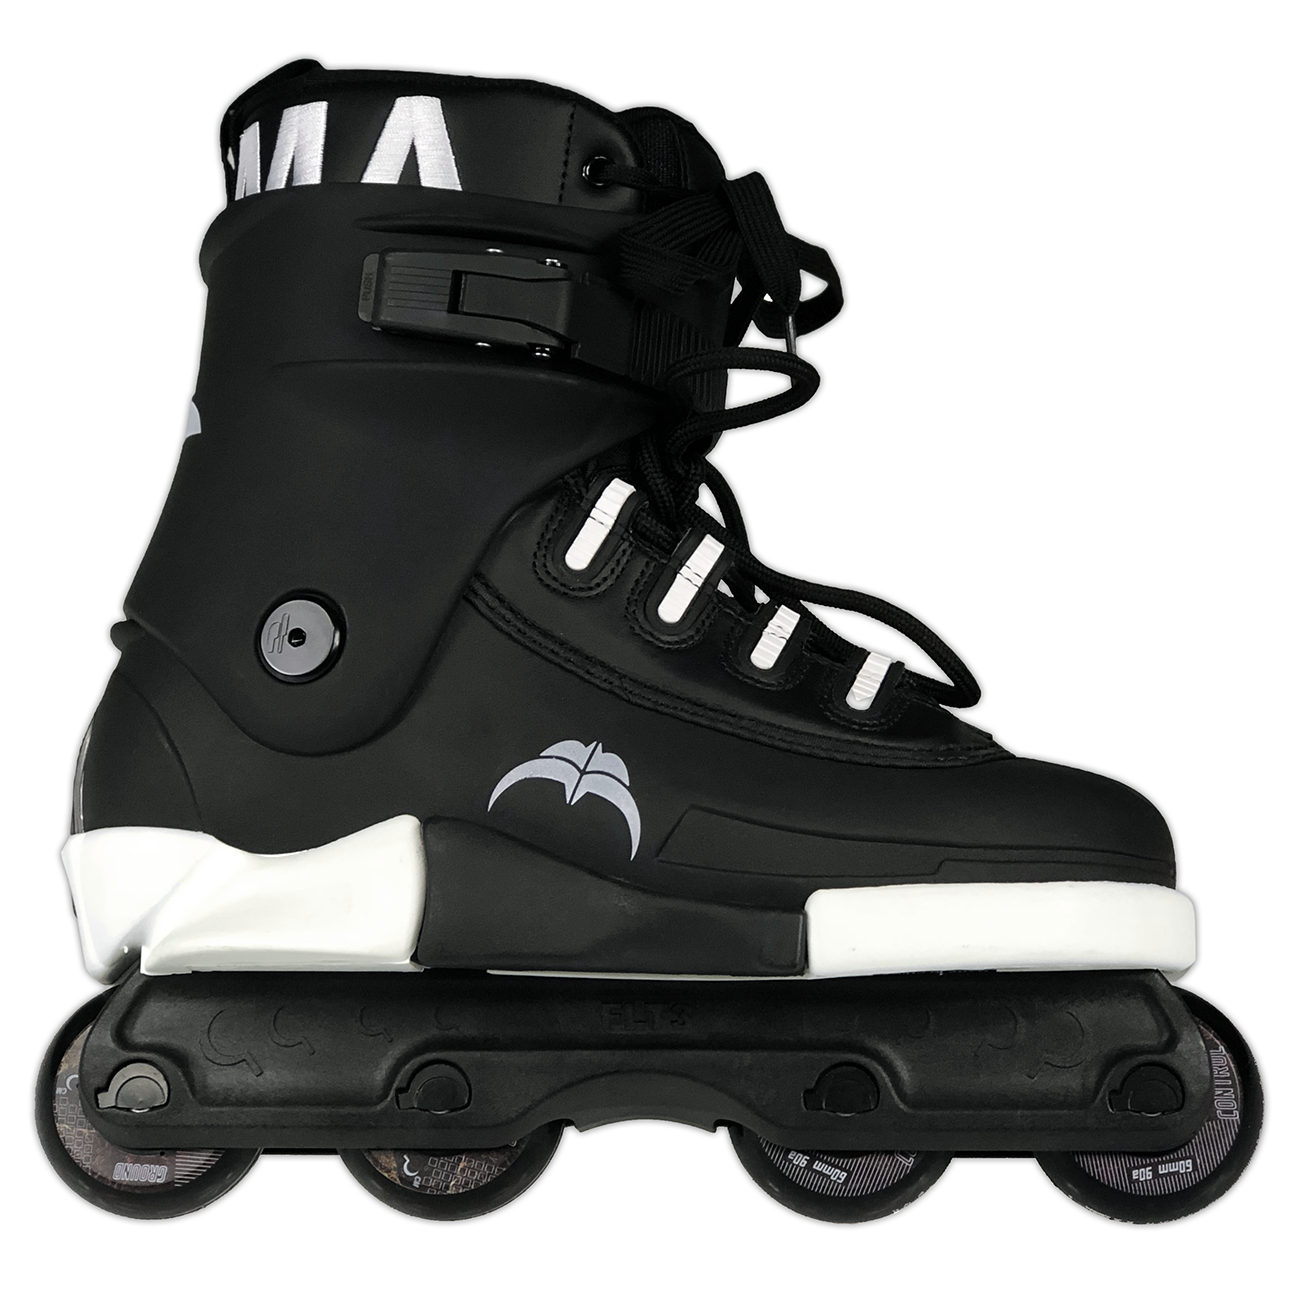 "Shima 1 Reissue Limited Edition"" - Stunt Skates"